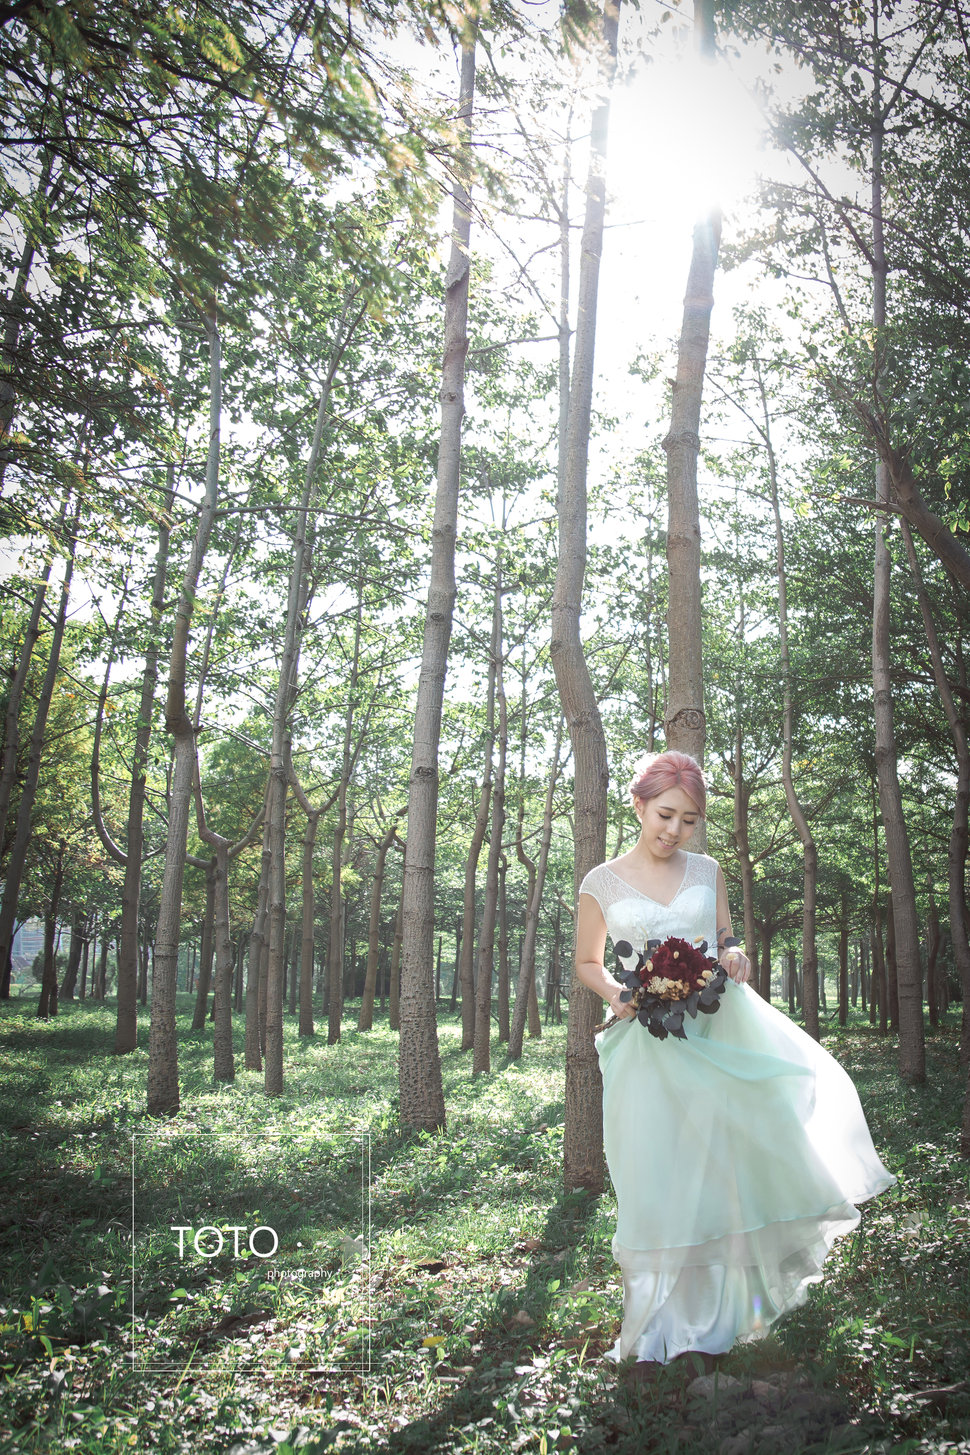 5K0B4862 - TOTO_Photo - 結婚吧